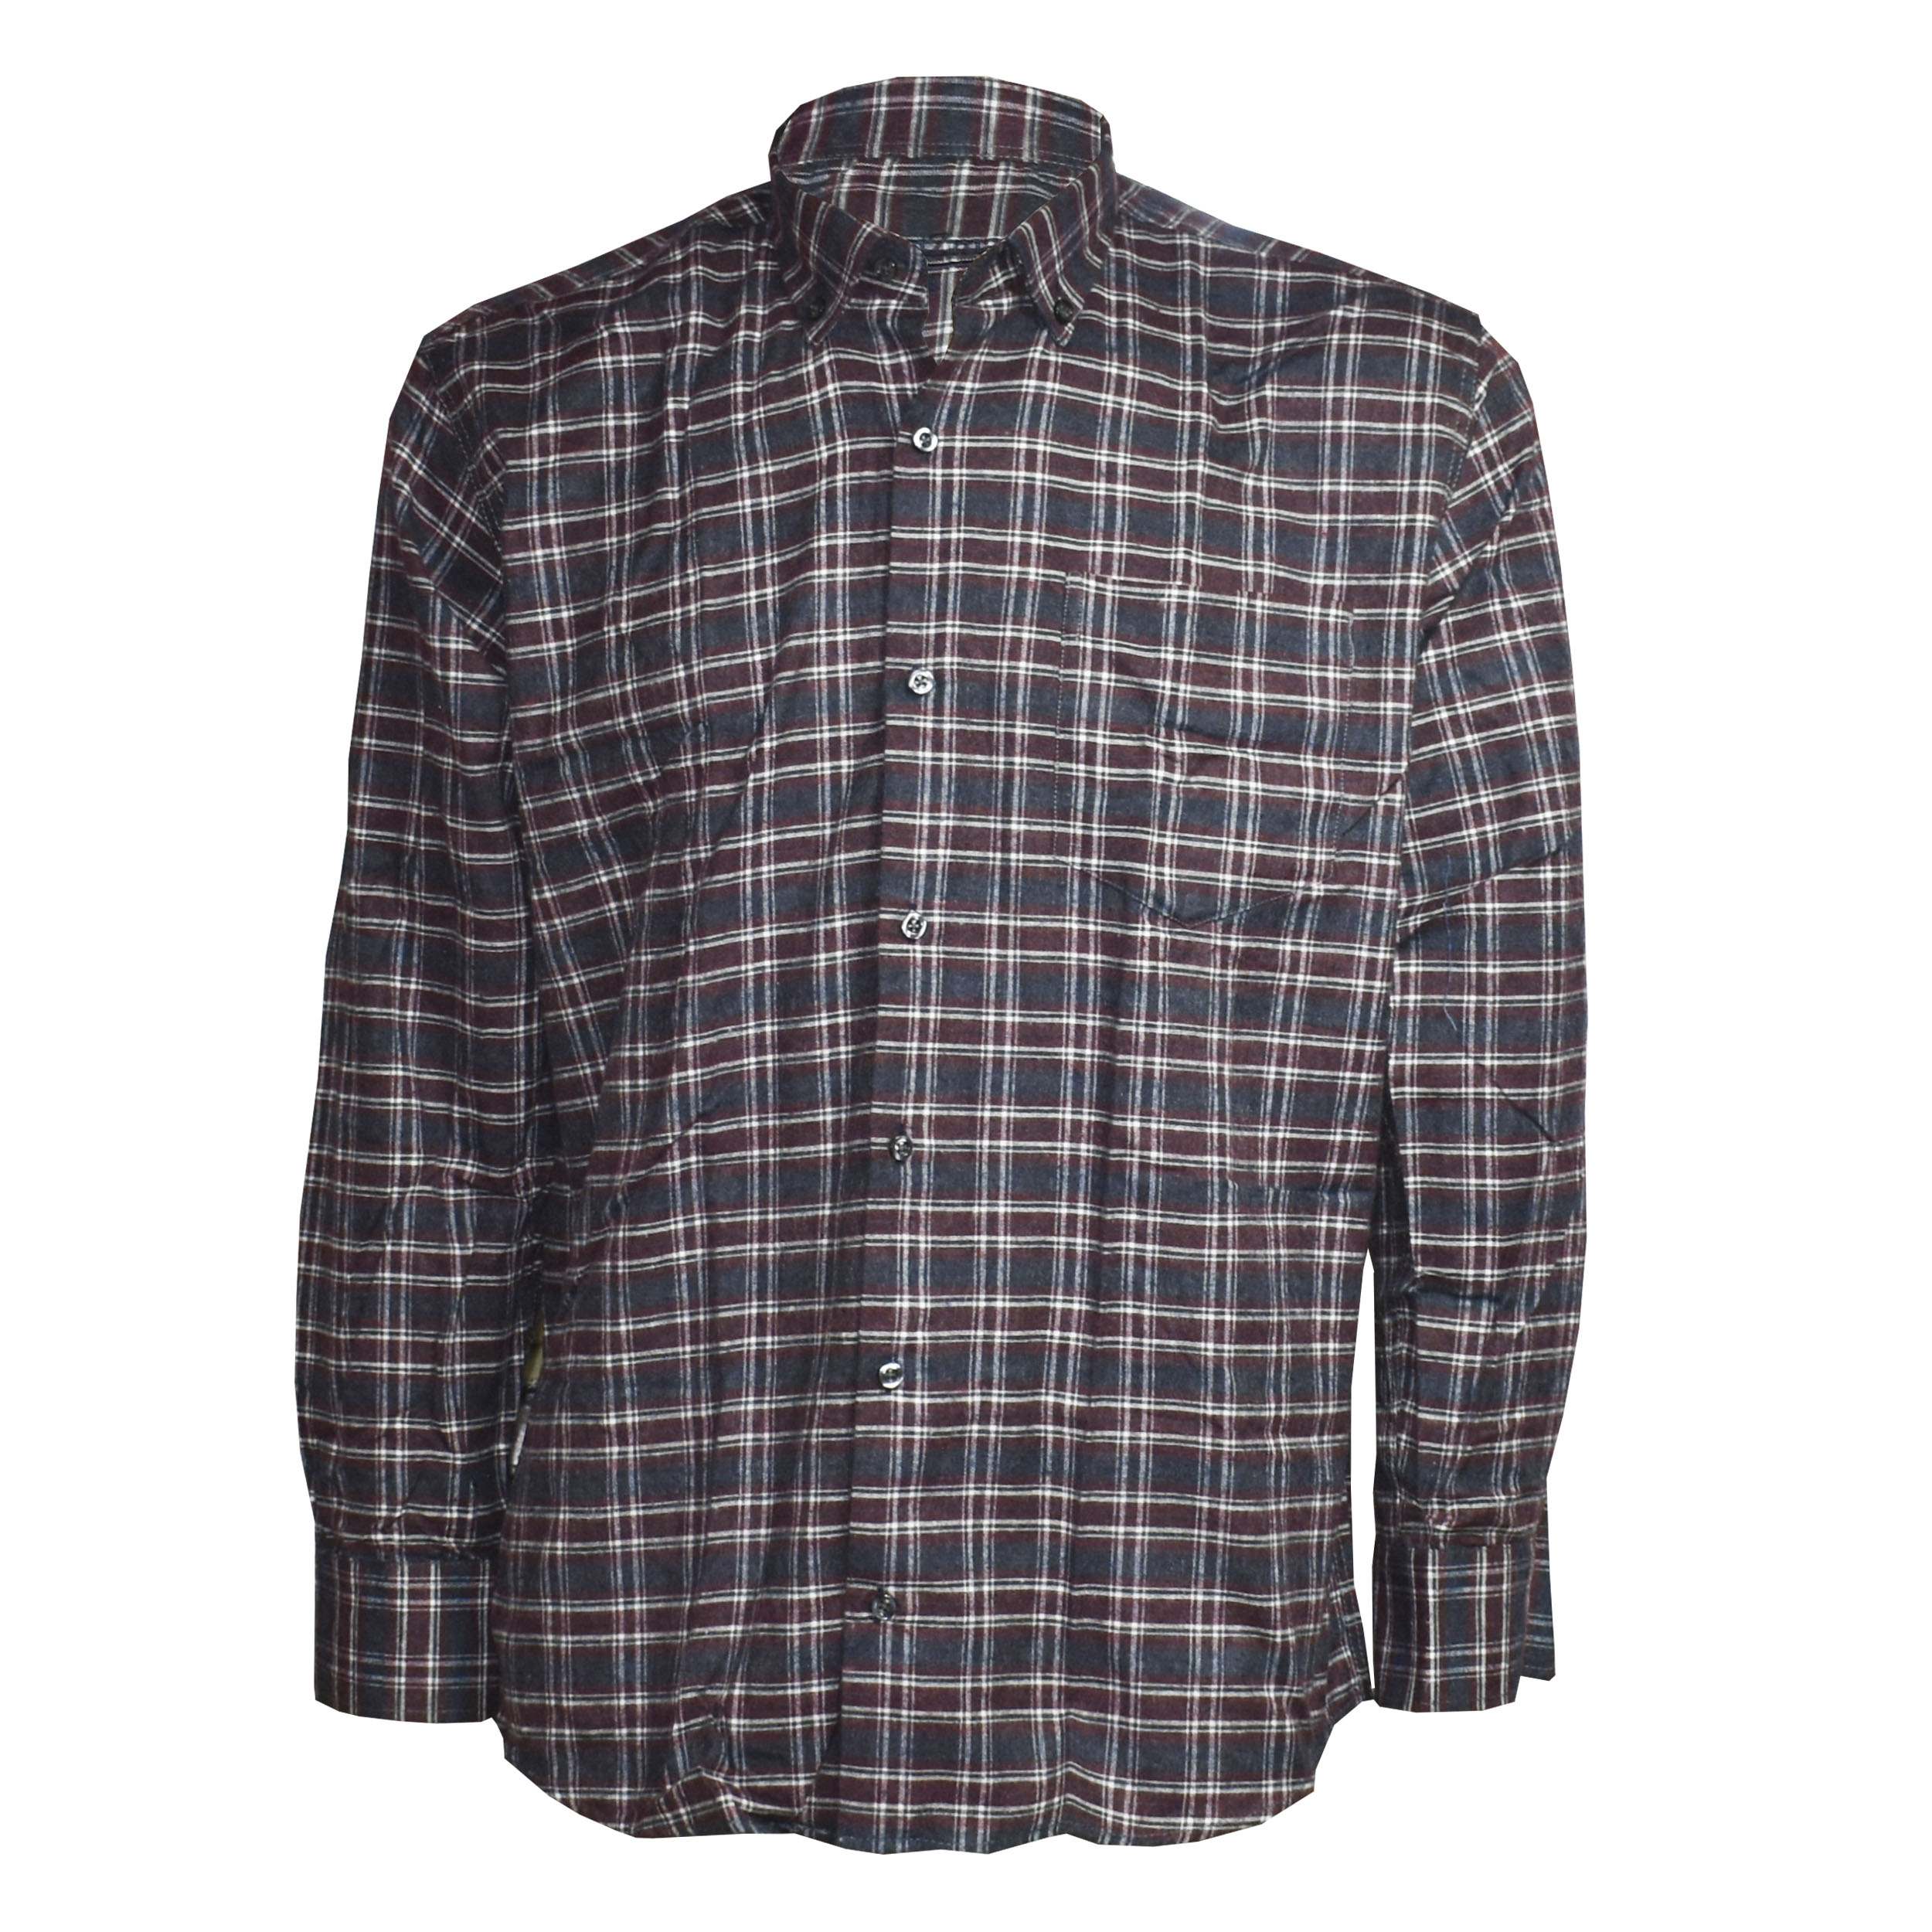 پیراهن مردانه کوکپون مدل WEW-455